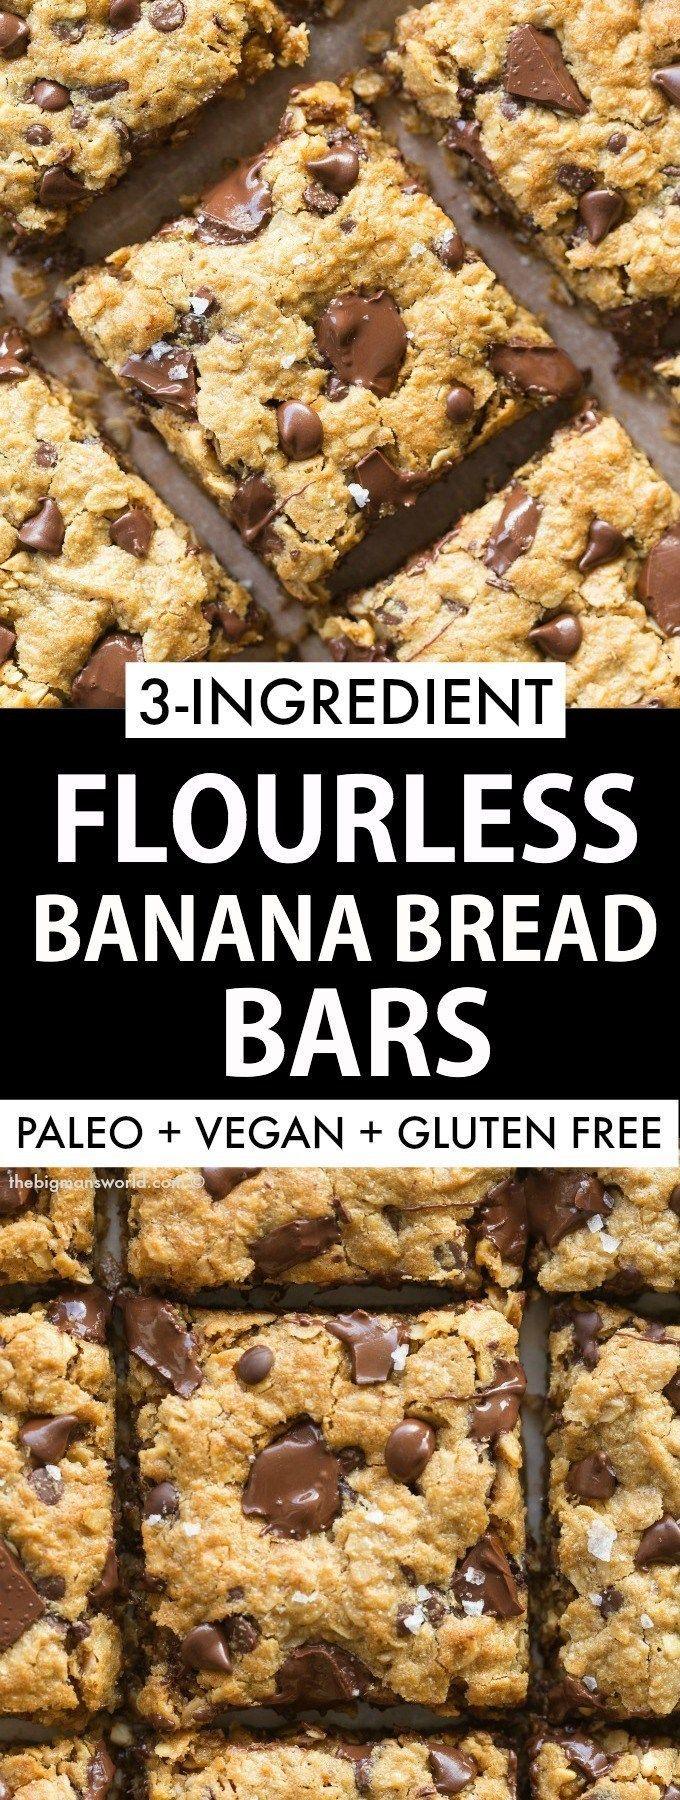 Healthy 3 Ingredient Flourless Banana Bread Bars | Recipe ...